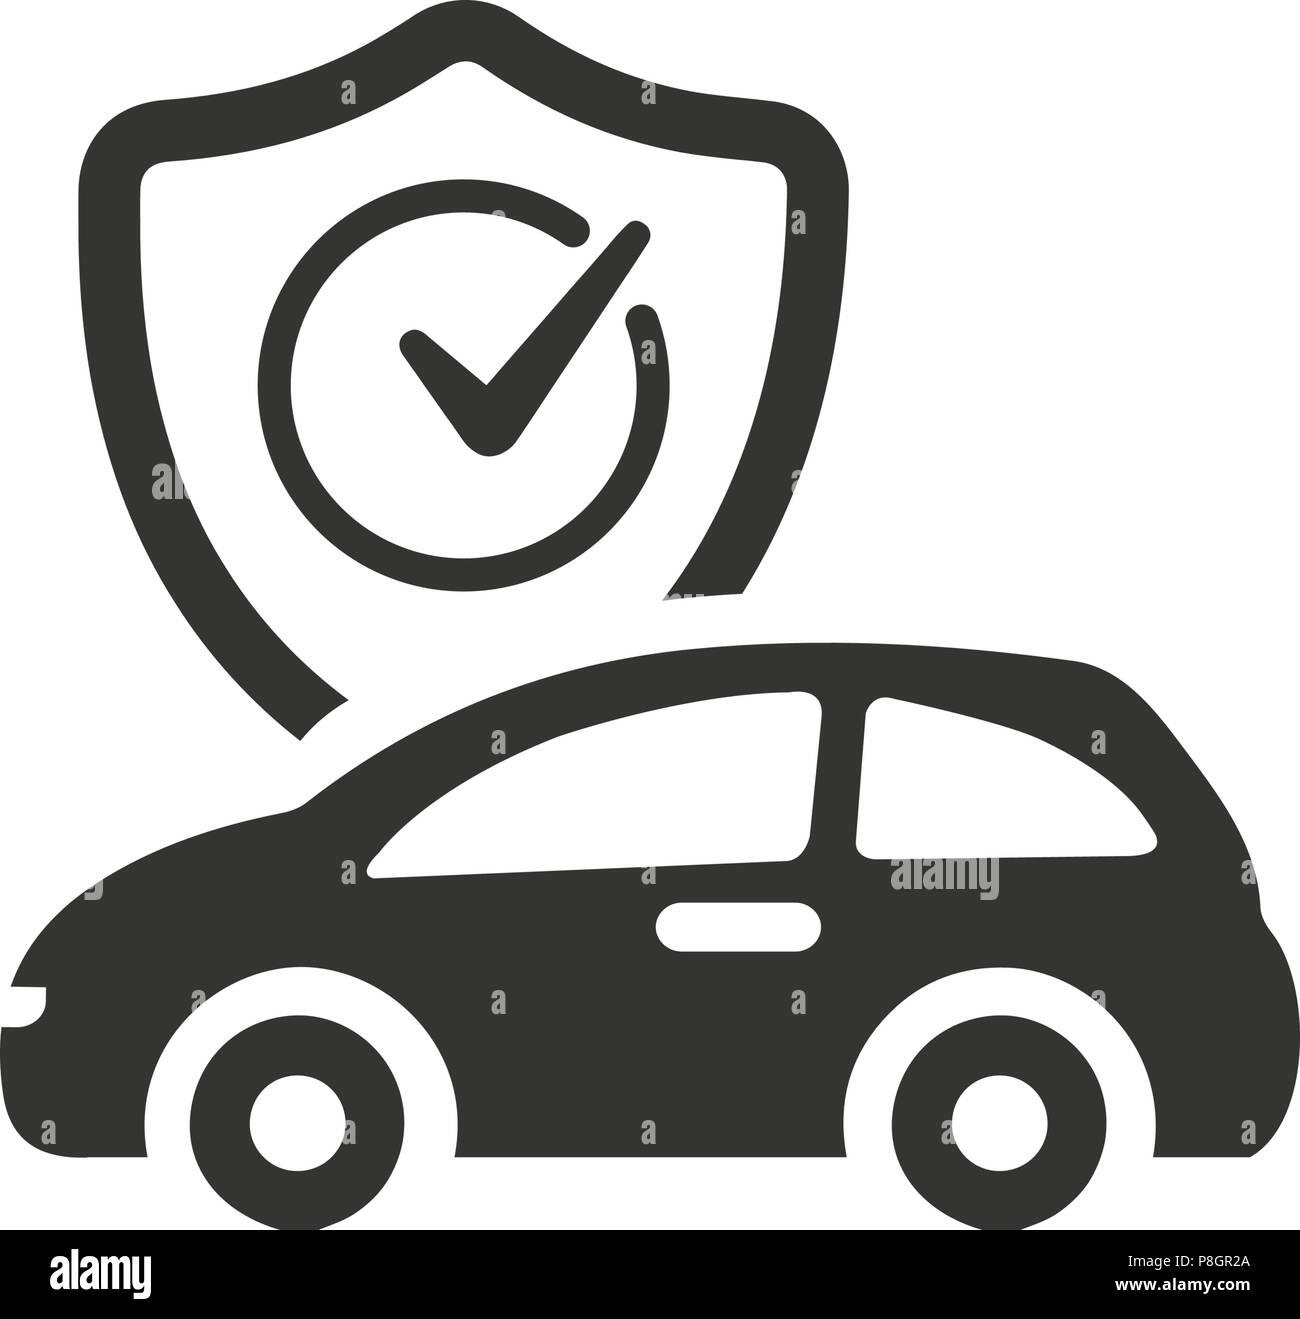 Auto Insurance Icon Stock Vector Art Illustration Vector Image